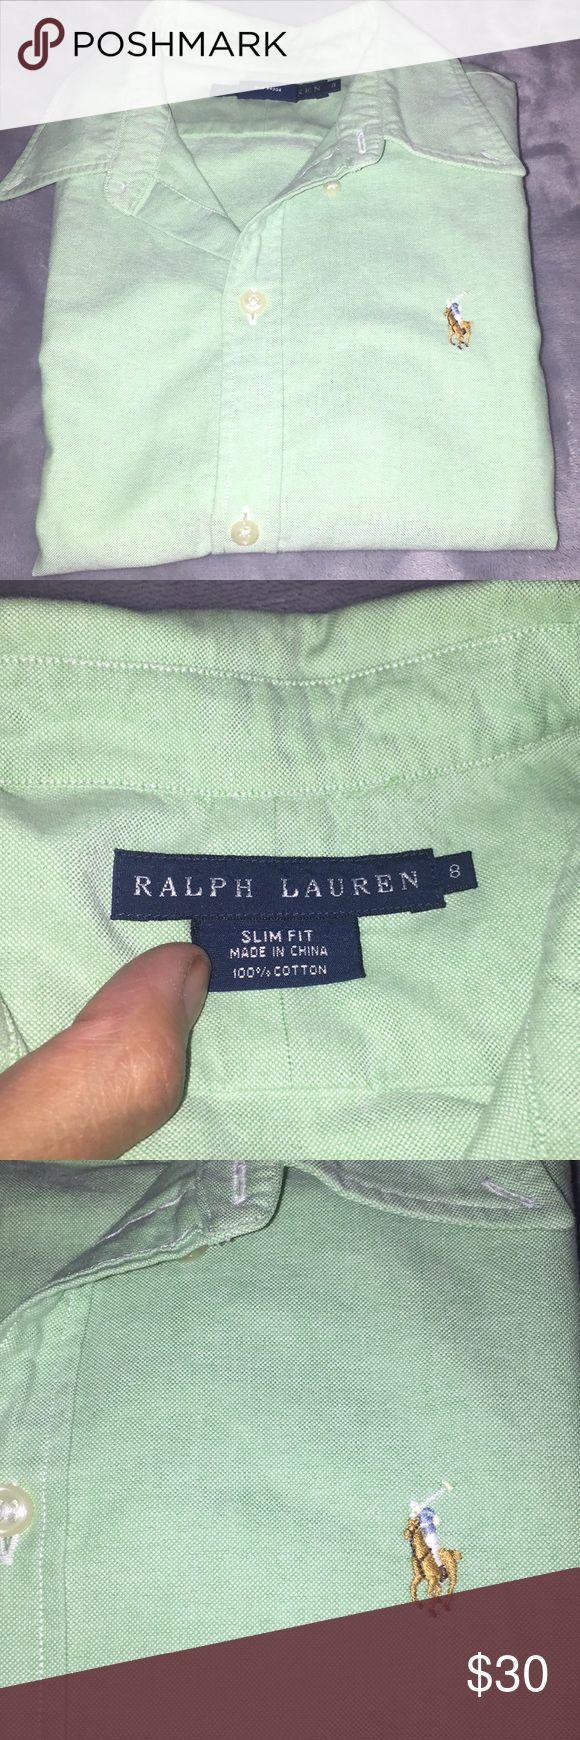 Ralph Lauren Slim Fit Button Down Women's Ralph Lauren Button down in great condition. Very versatile shirt. Slim Fit. Ralph Lauren Tops Button Down Shirts